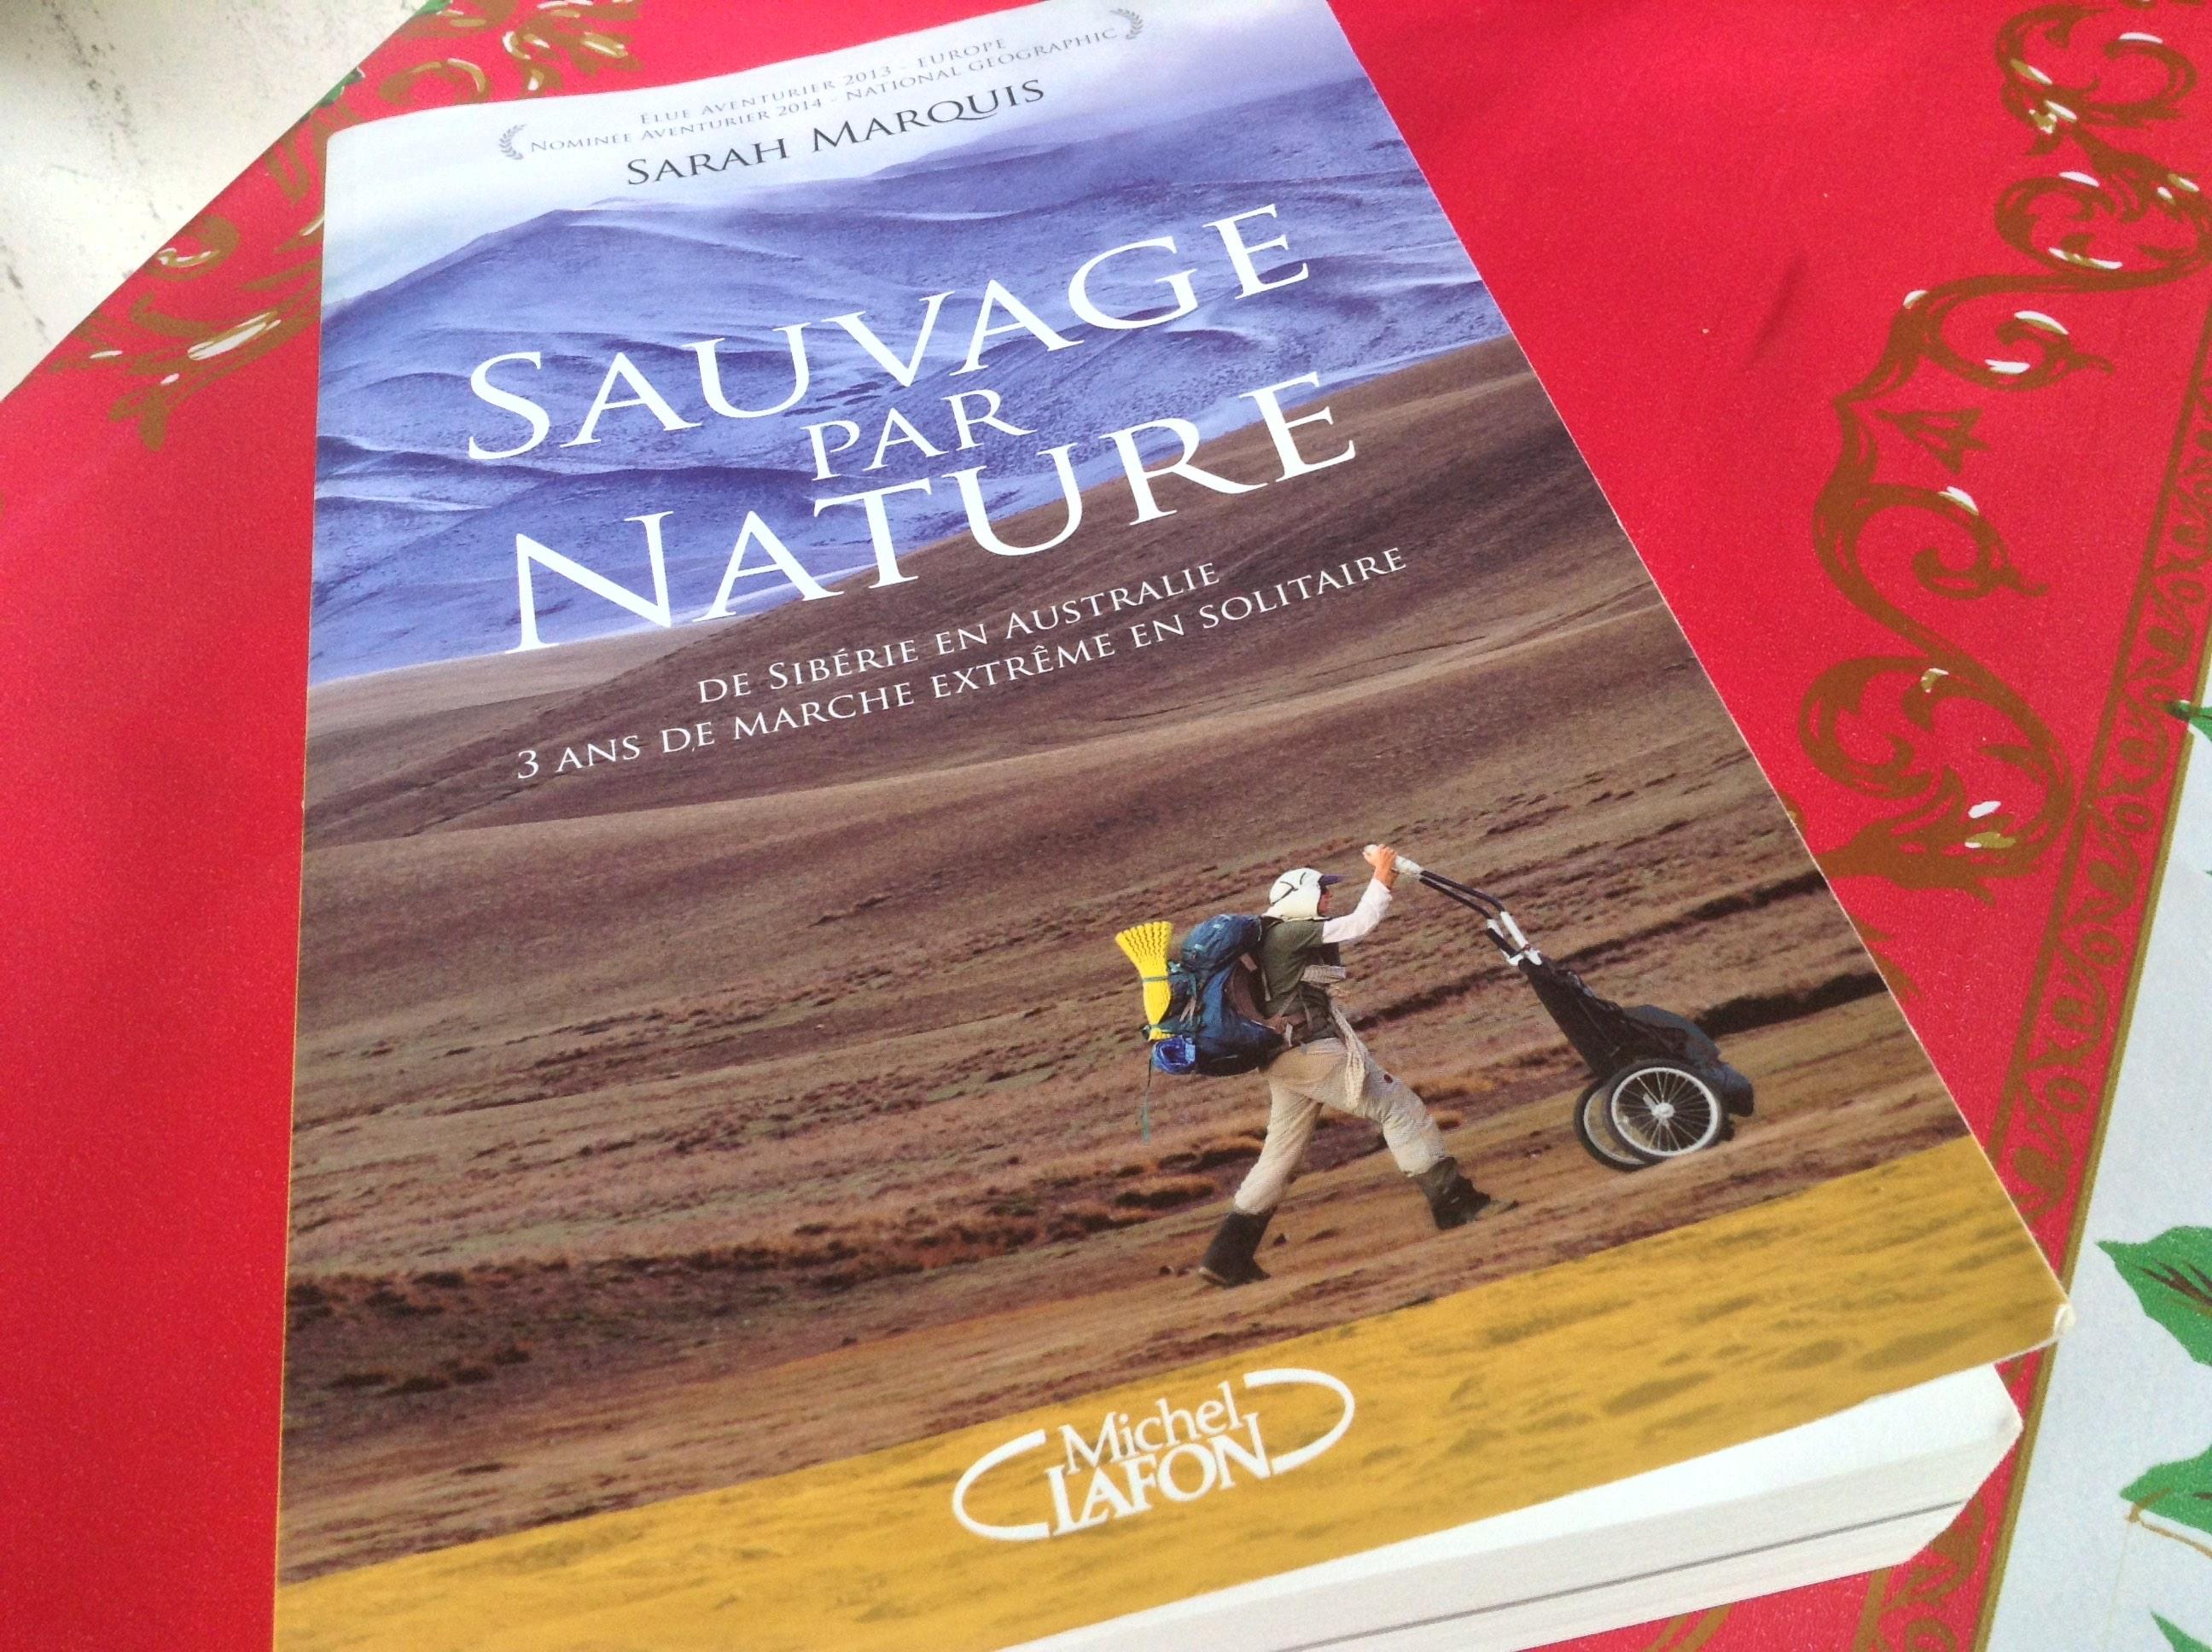 Livre Sarah Marquis - Sauvage par nature